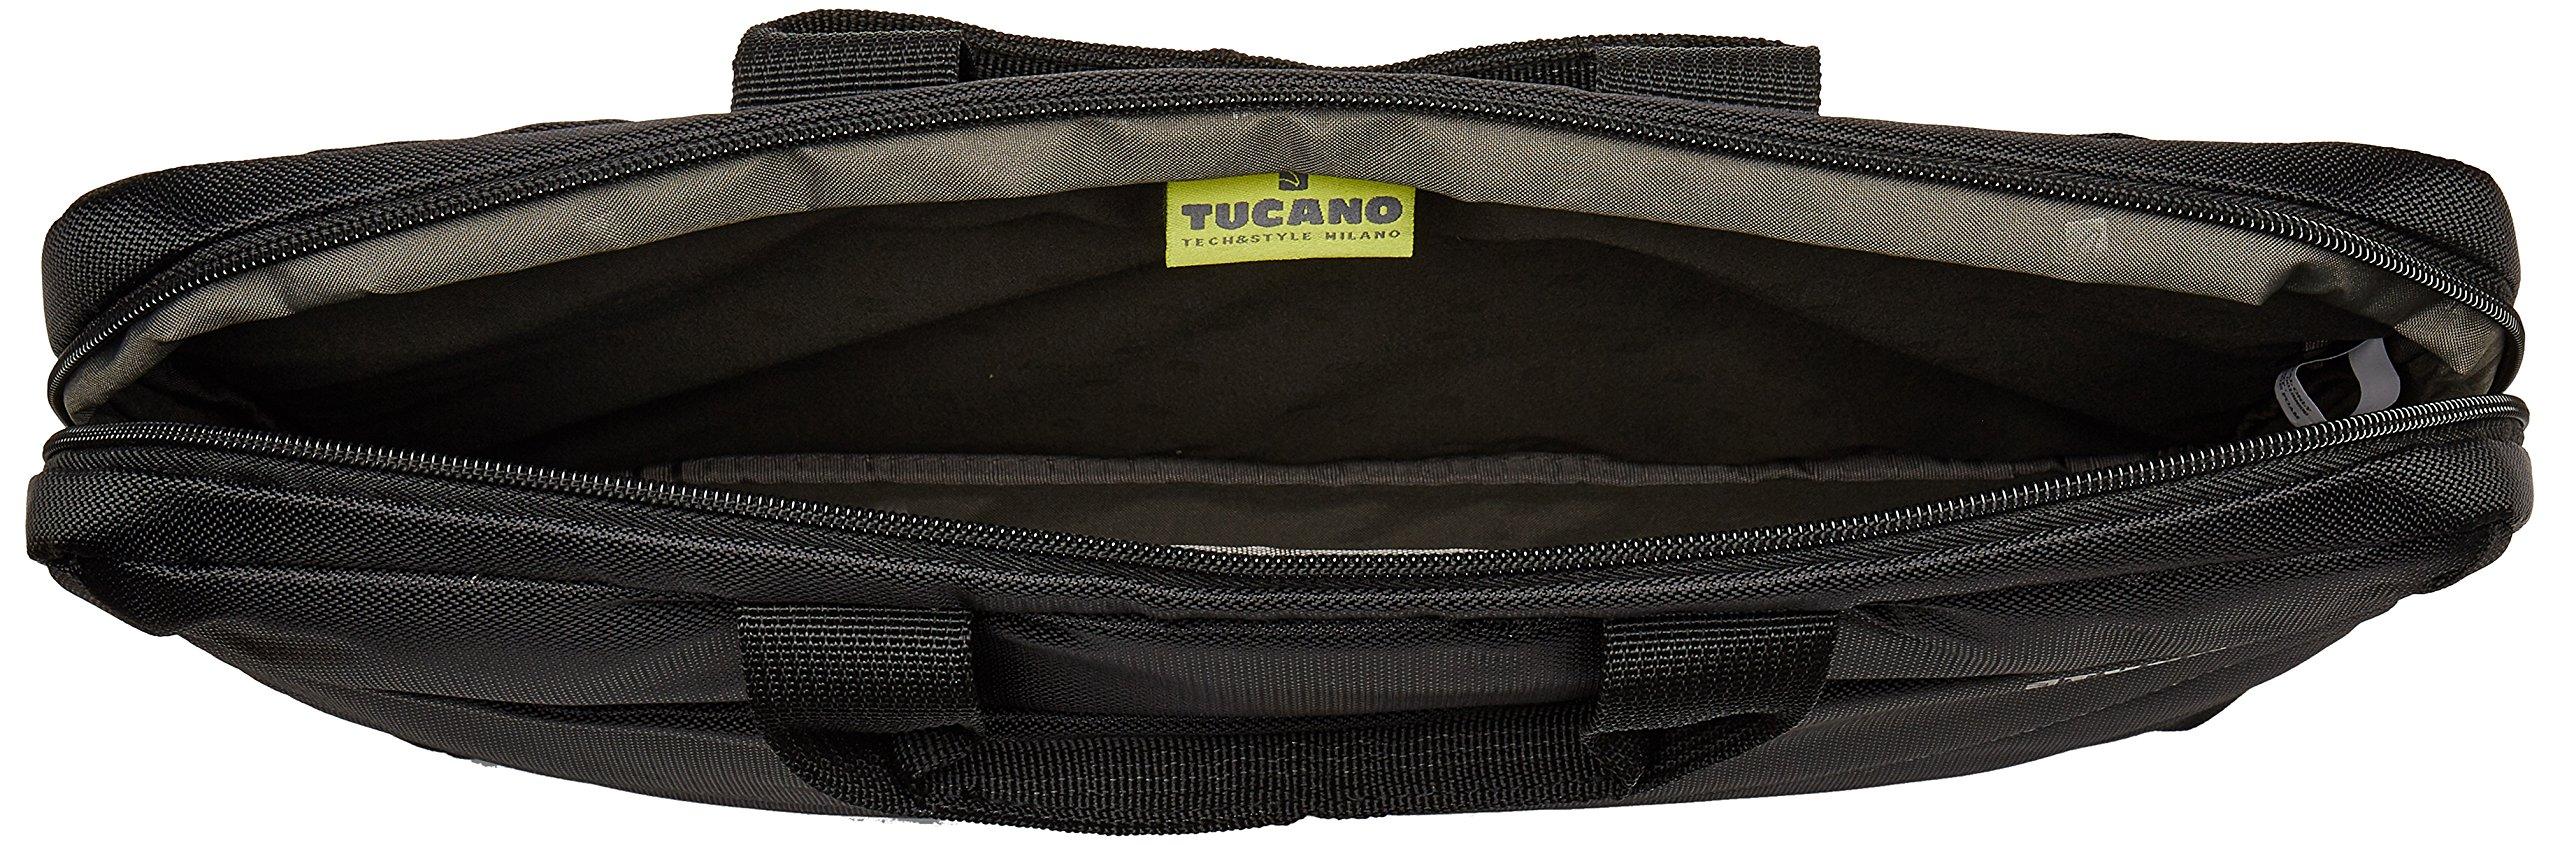 TUCANO B-IDEA Laptop Computer Bags & Cases